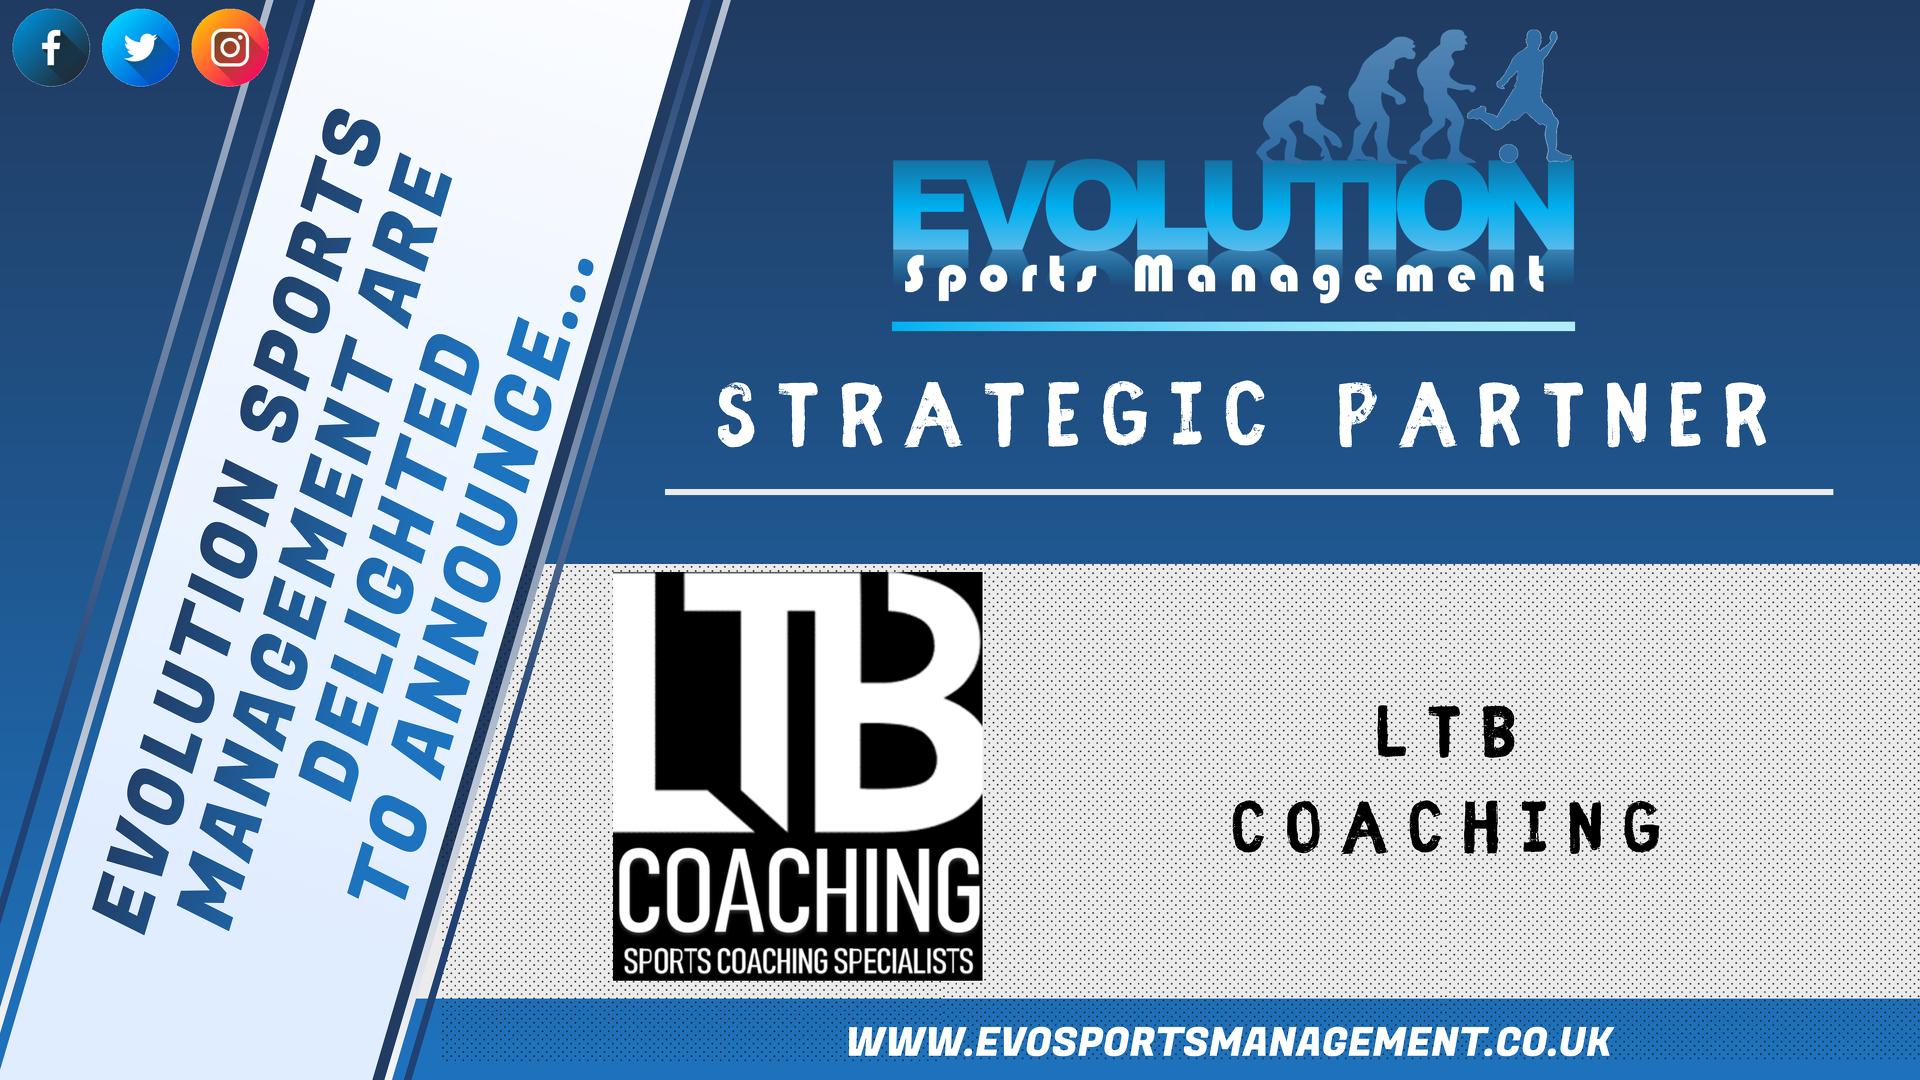 LTB Coaching Partnership Announcement